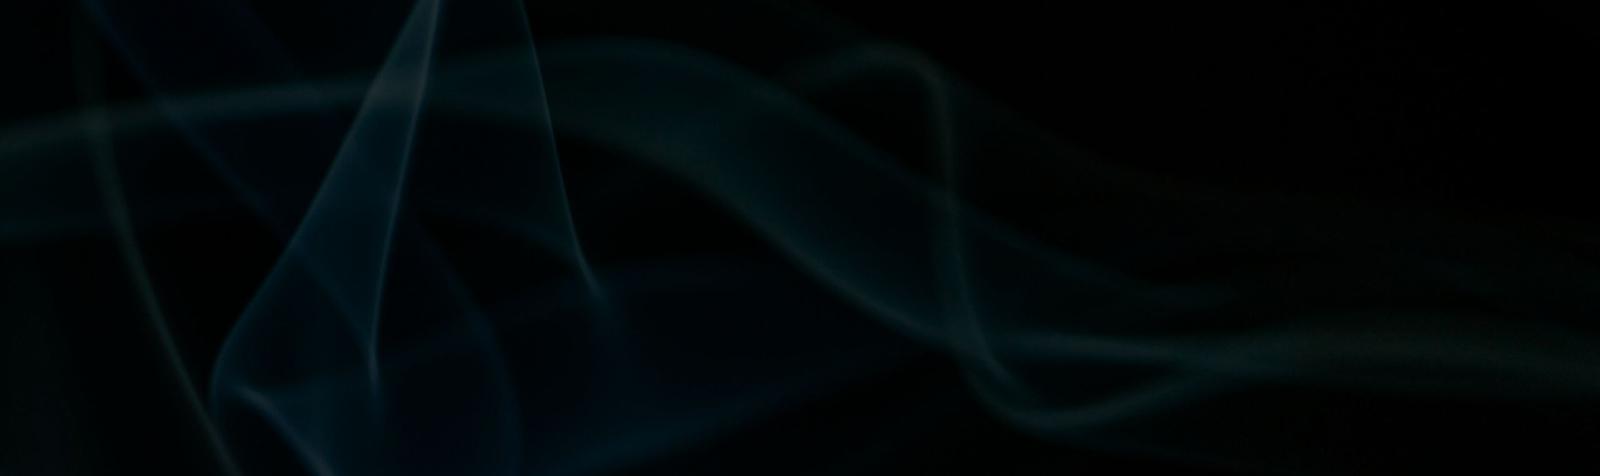 Spökjakt Säsong 2 (Dplay)